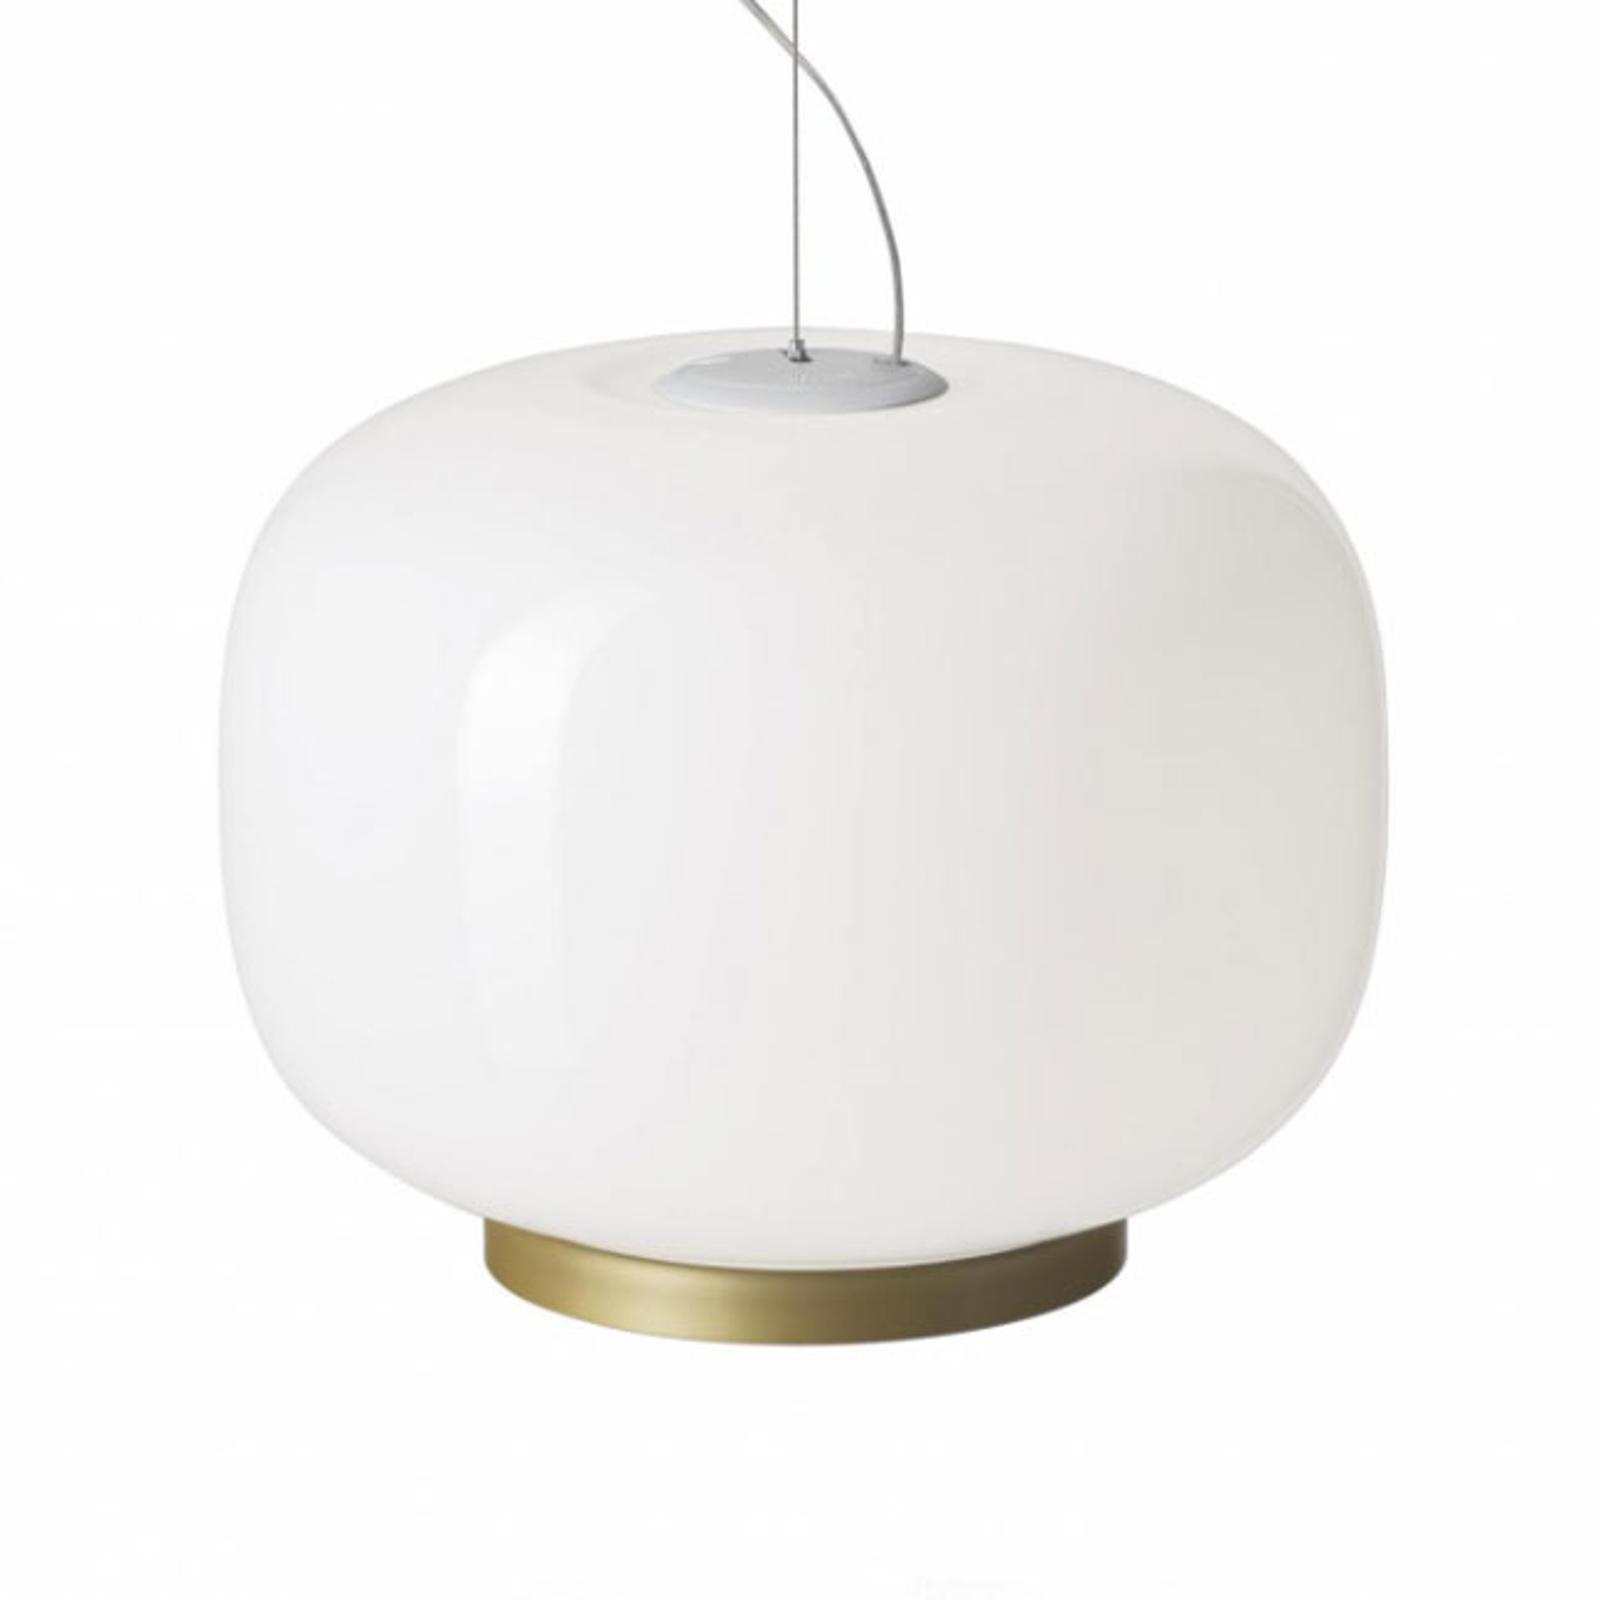 Foscarini Chouchin Reverse 1 LED gold/weiß dimmbar